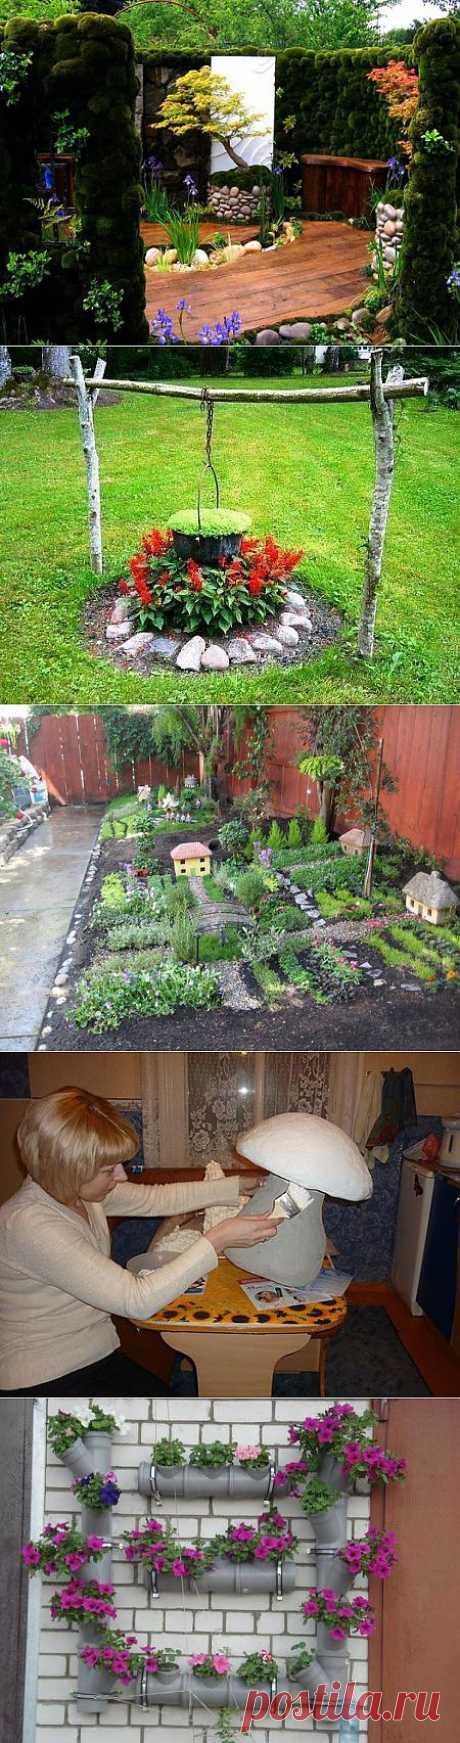 Идеи для дачи-огорода | ОГОРОД БЕЗ ХЛОПОТ